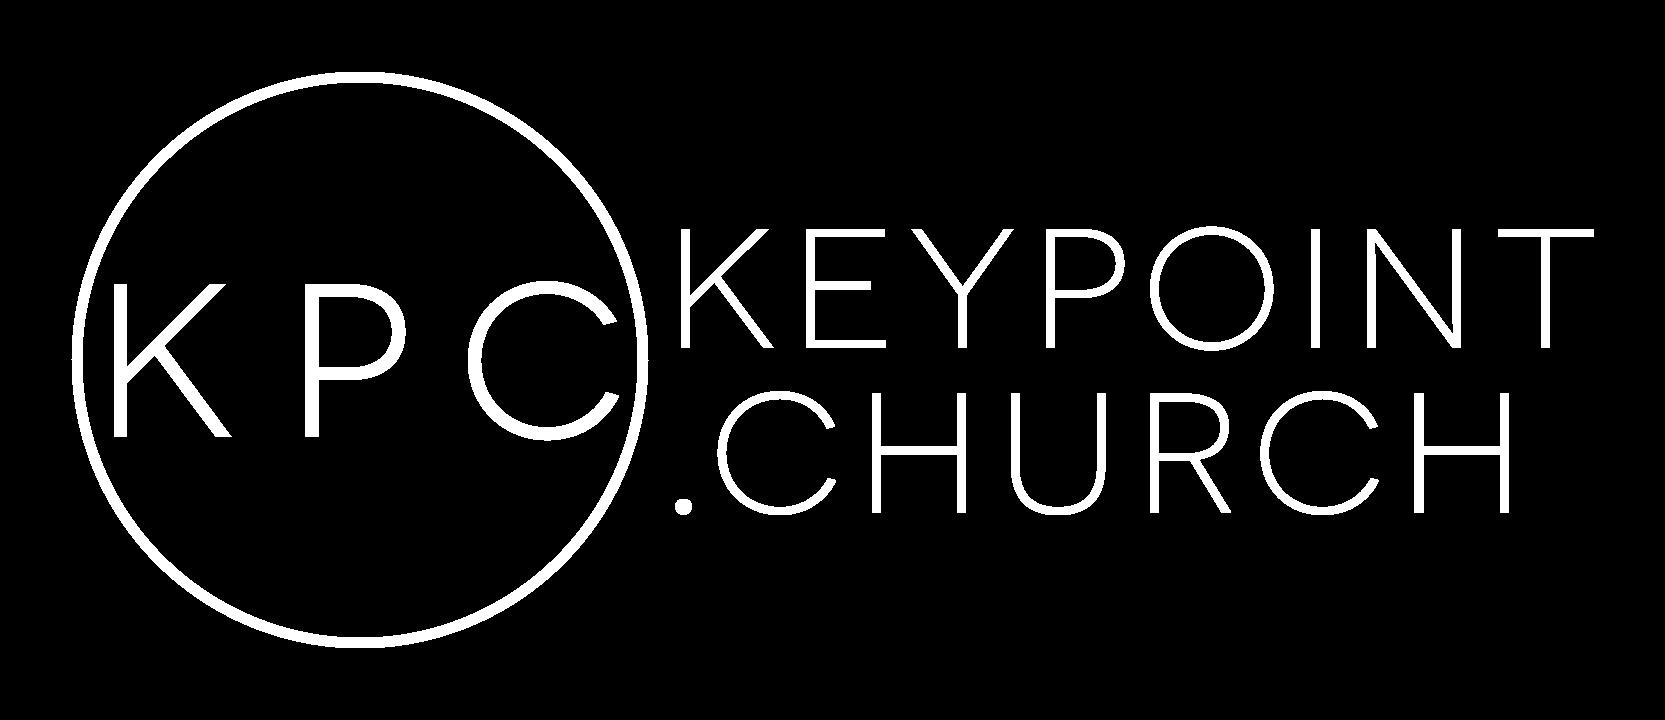 Keypoint logo